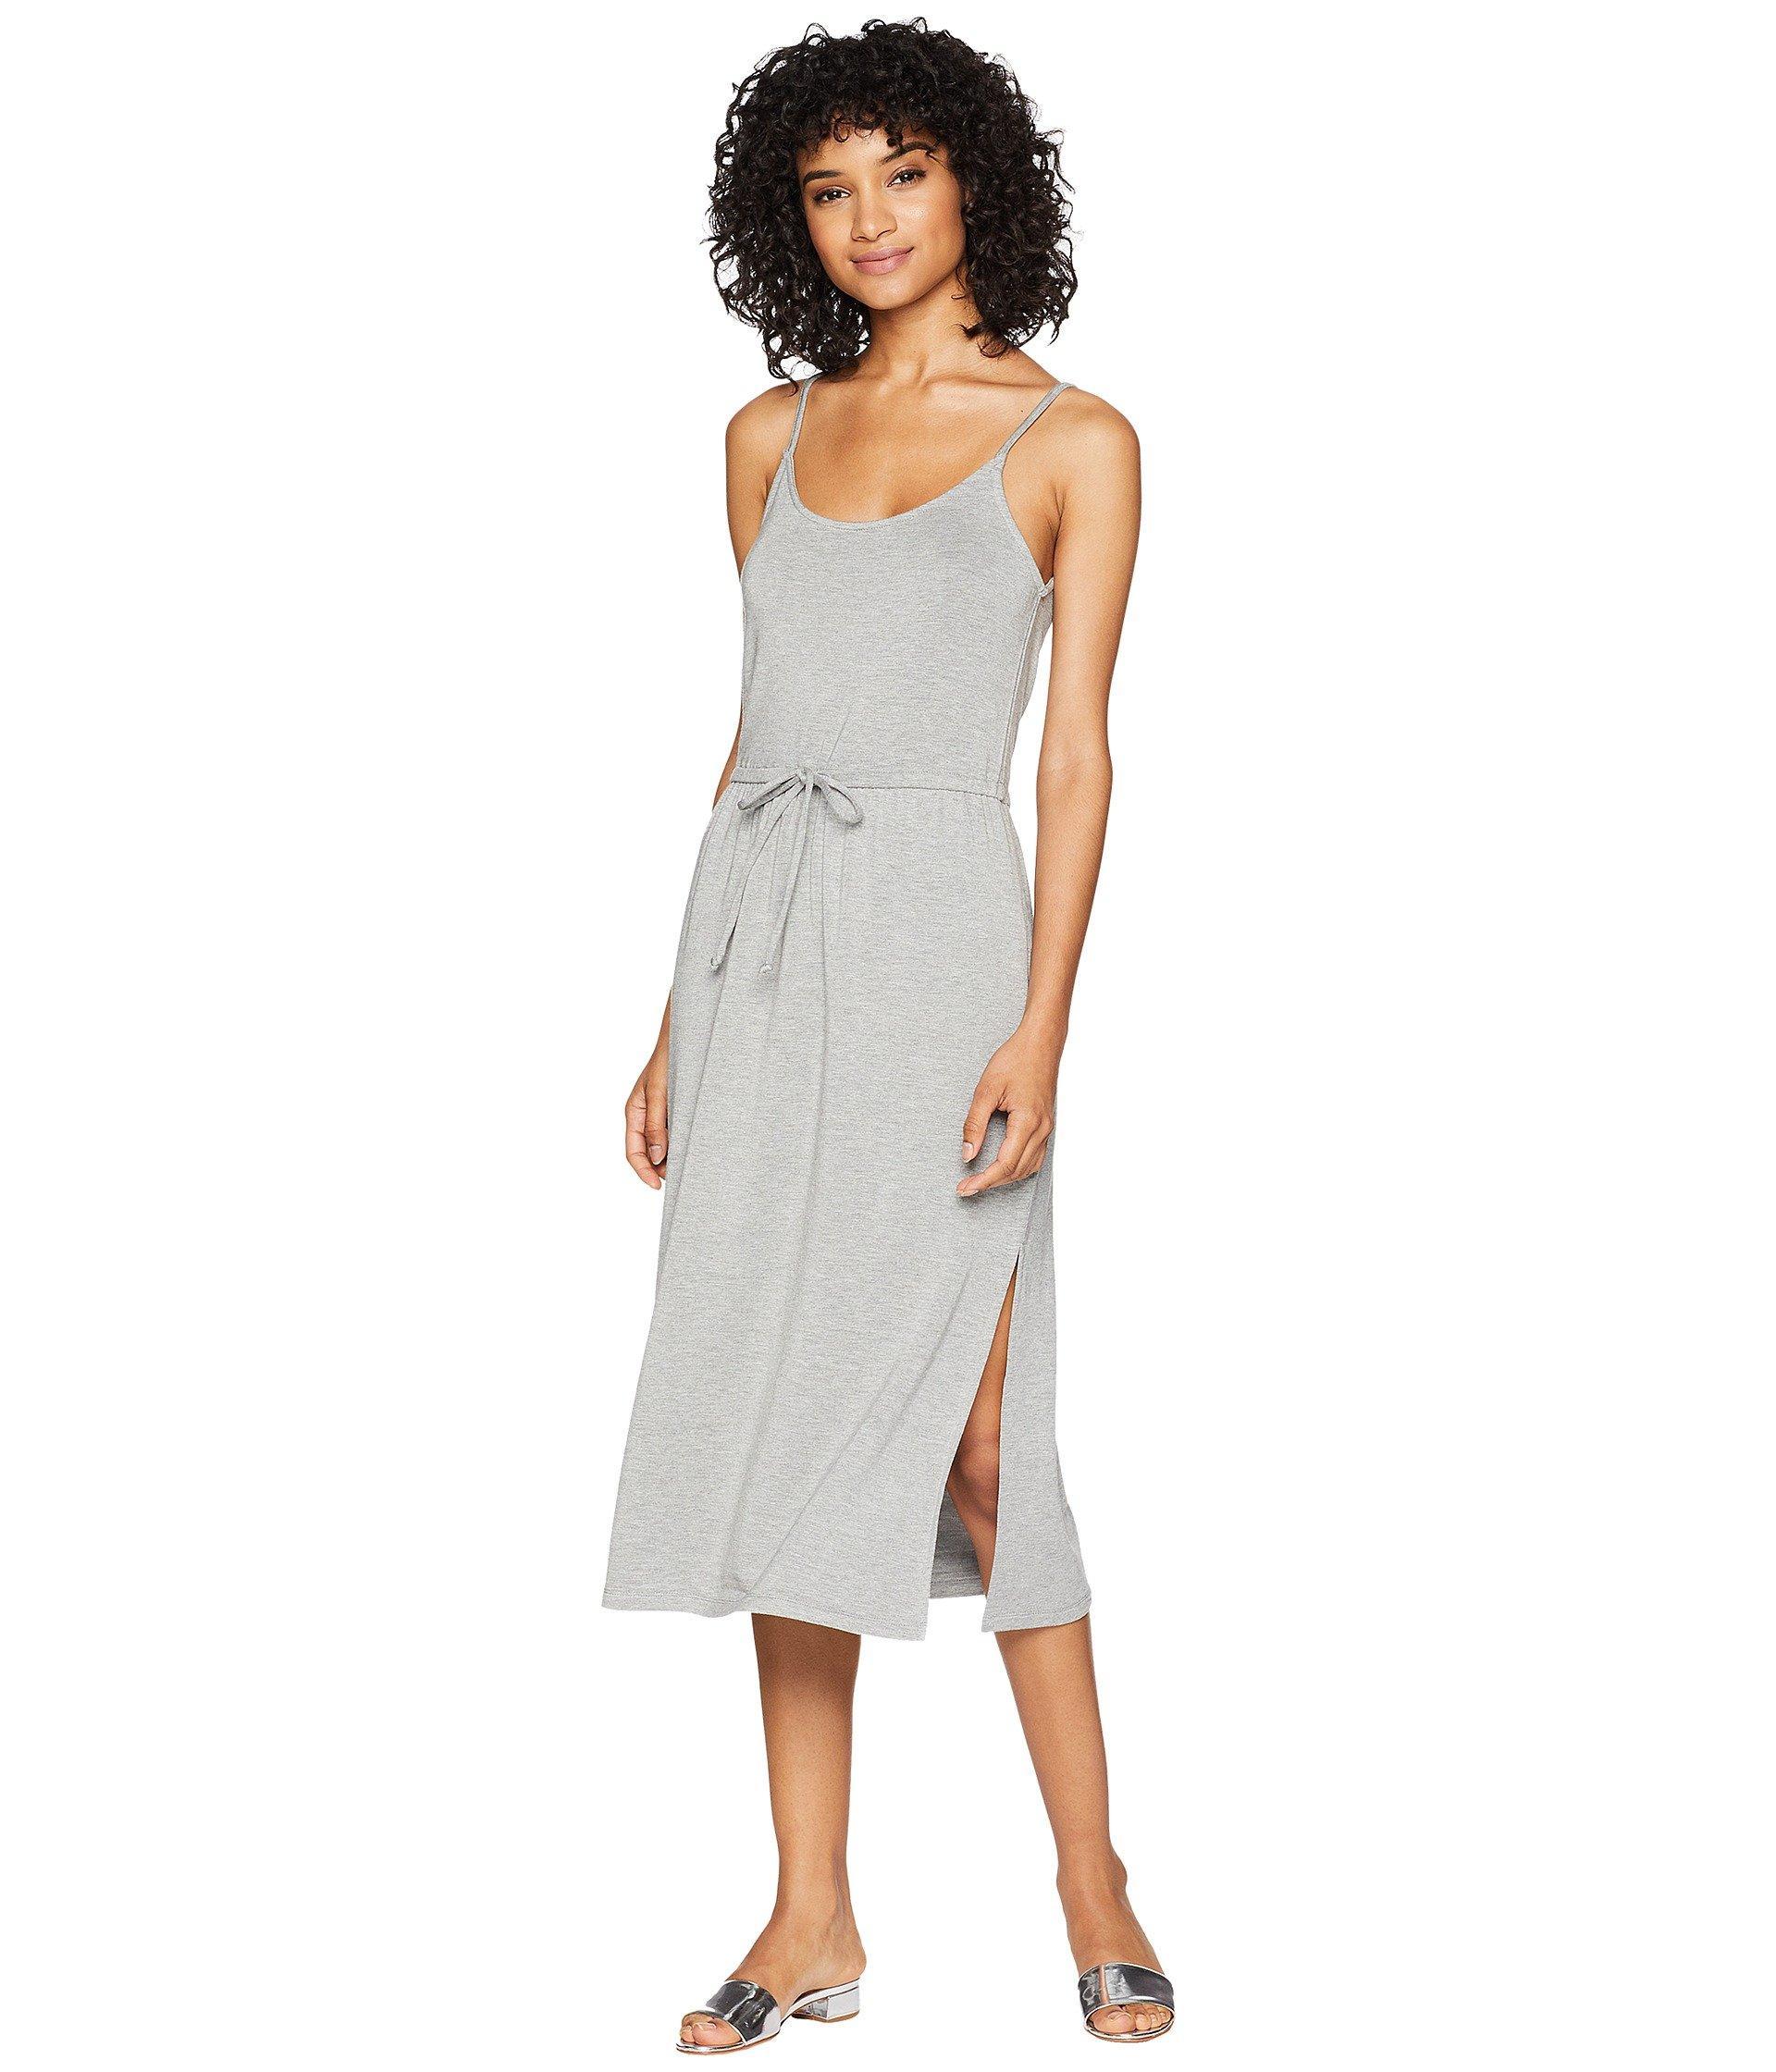 35c3cc0b4b02 Lyst - BB Dakota Everyday s Like Sunday Knit Dress in Gray - Save 44%